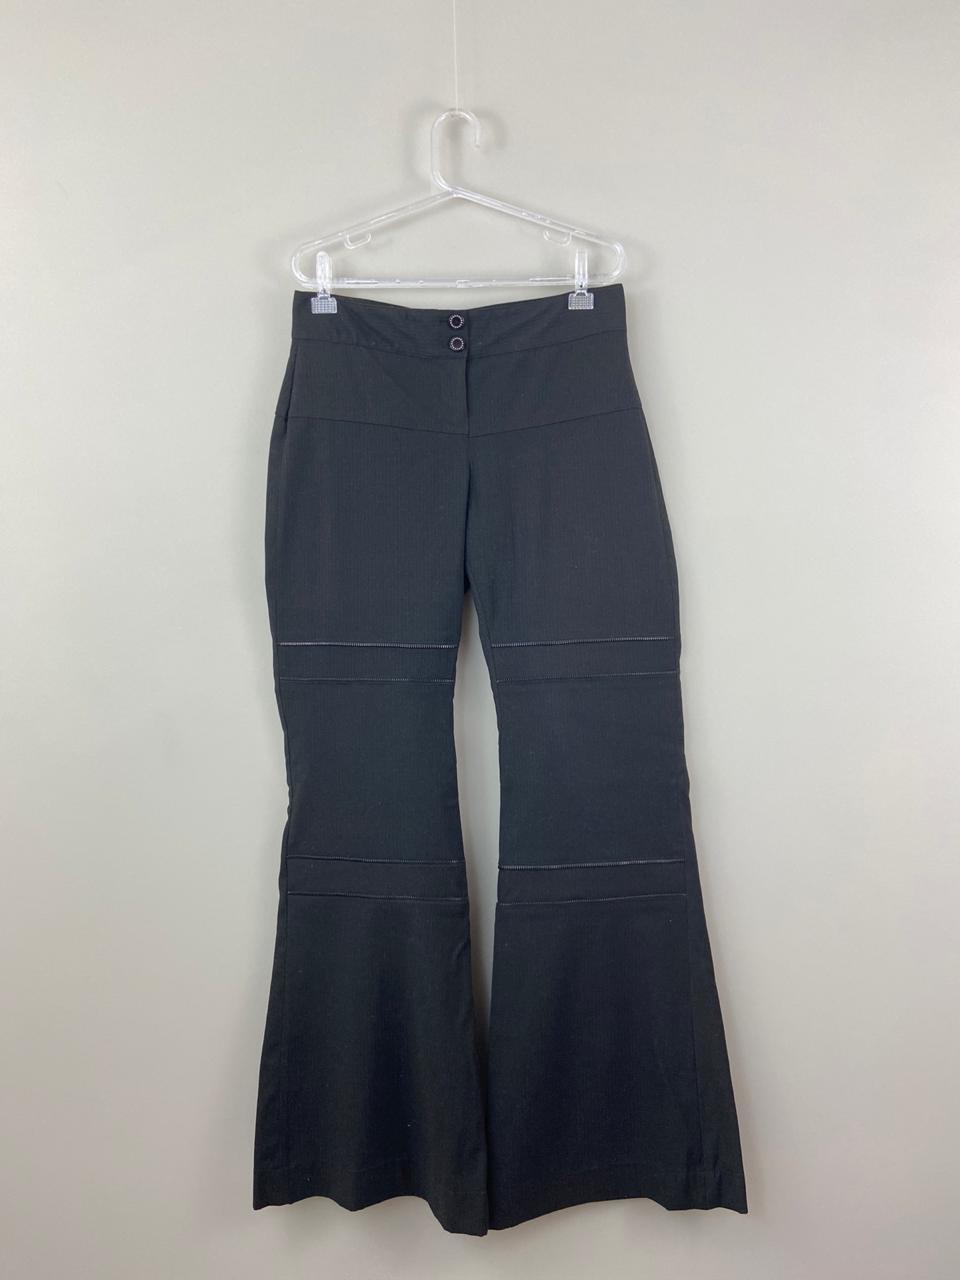 Pantalona preta detalhe zíper pernas Mixed tam 40